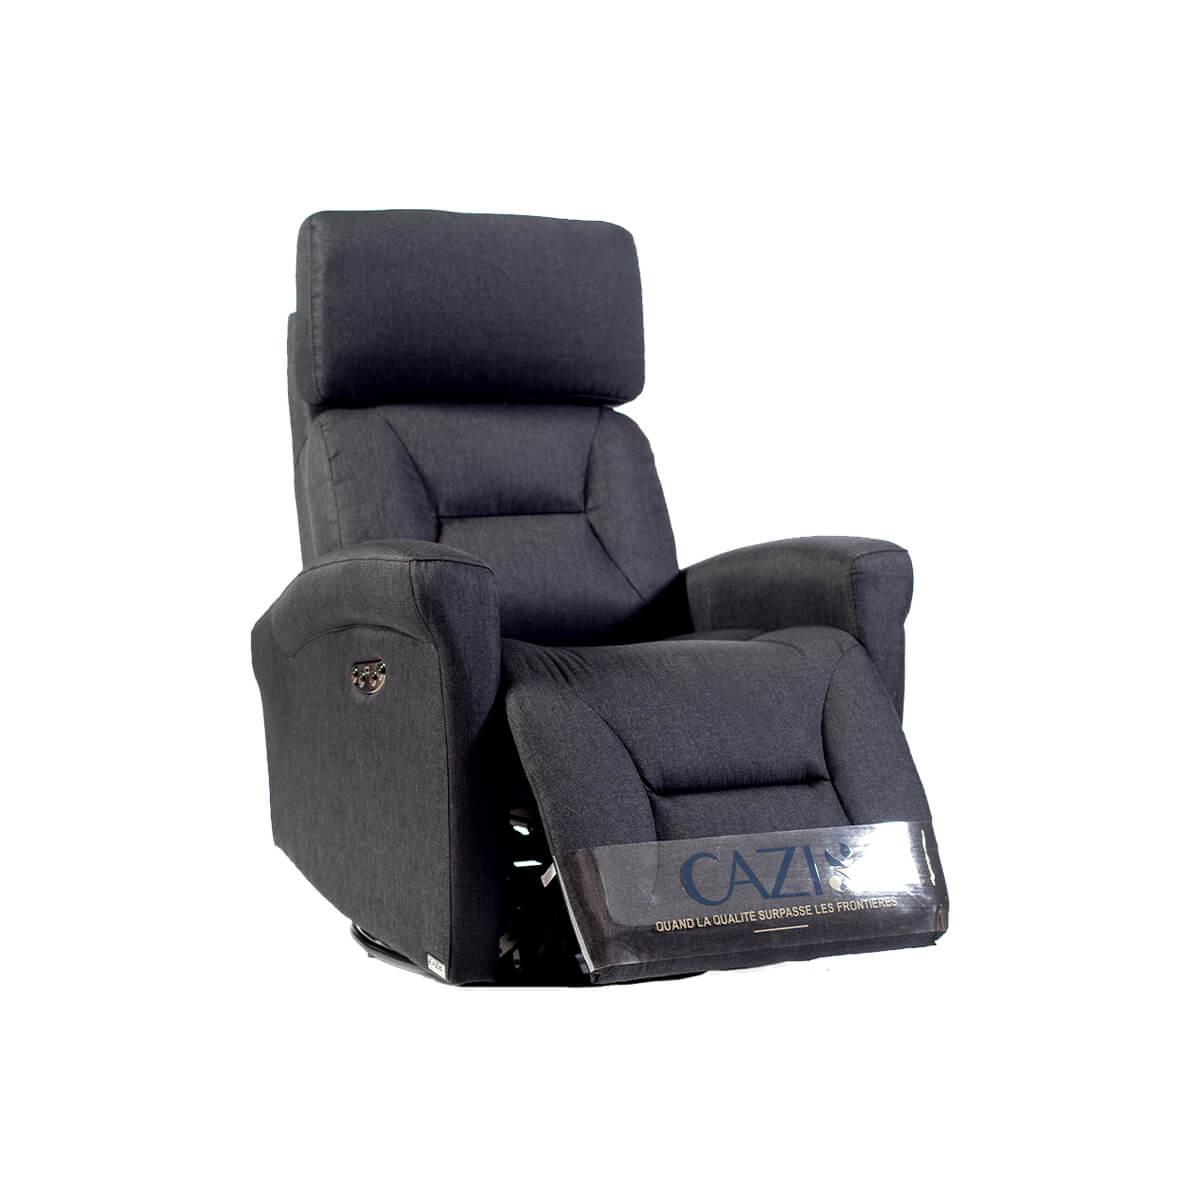 cazis-barcelona-fauteuil-flash-decor